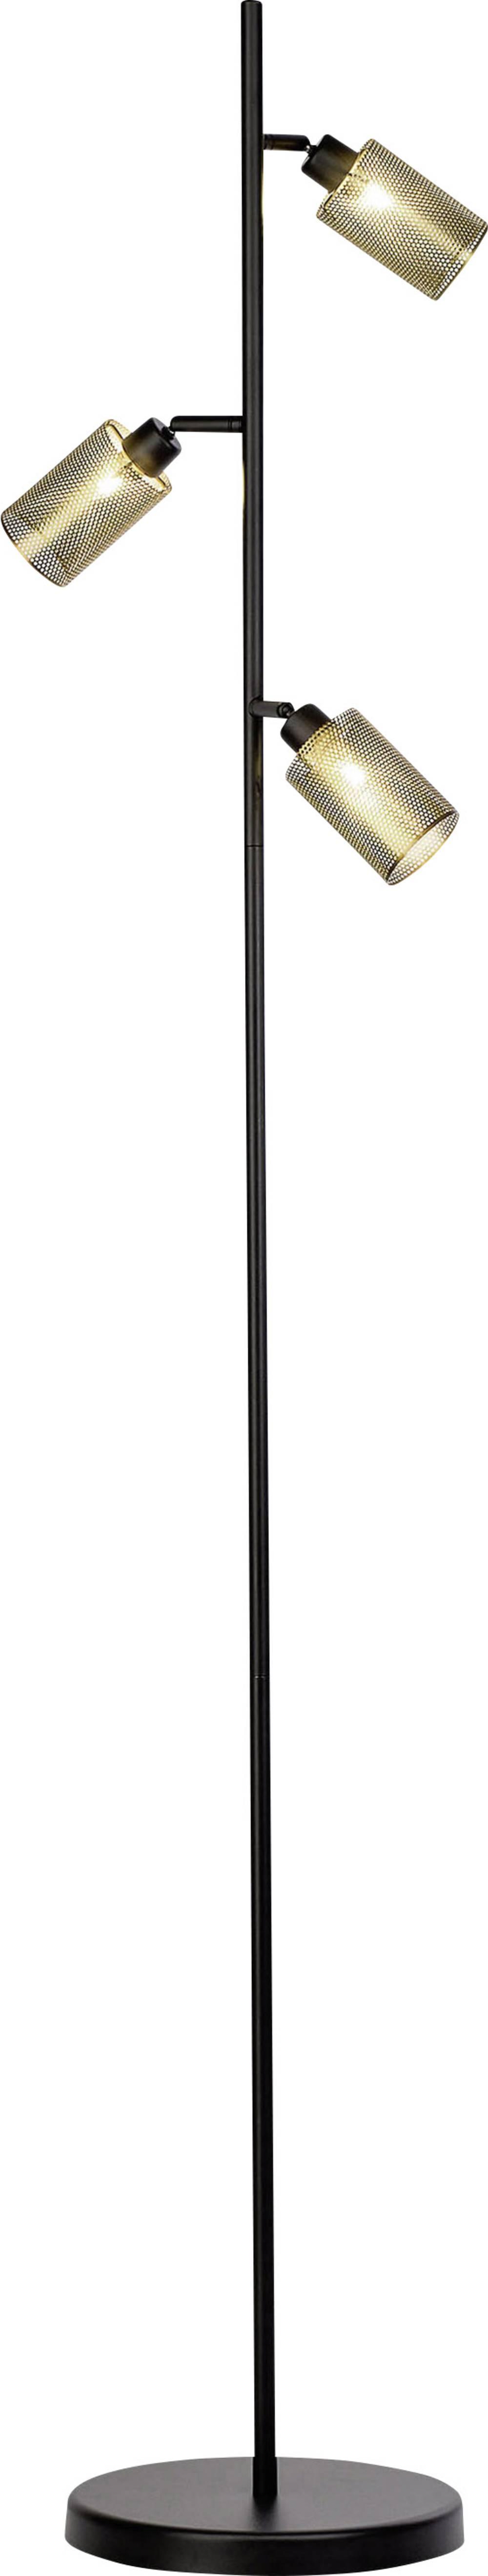 lampada a stelo led g9 60 w brilliant mesh 99014/76 in vendita